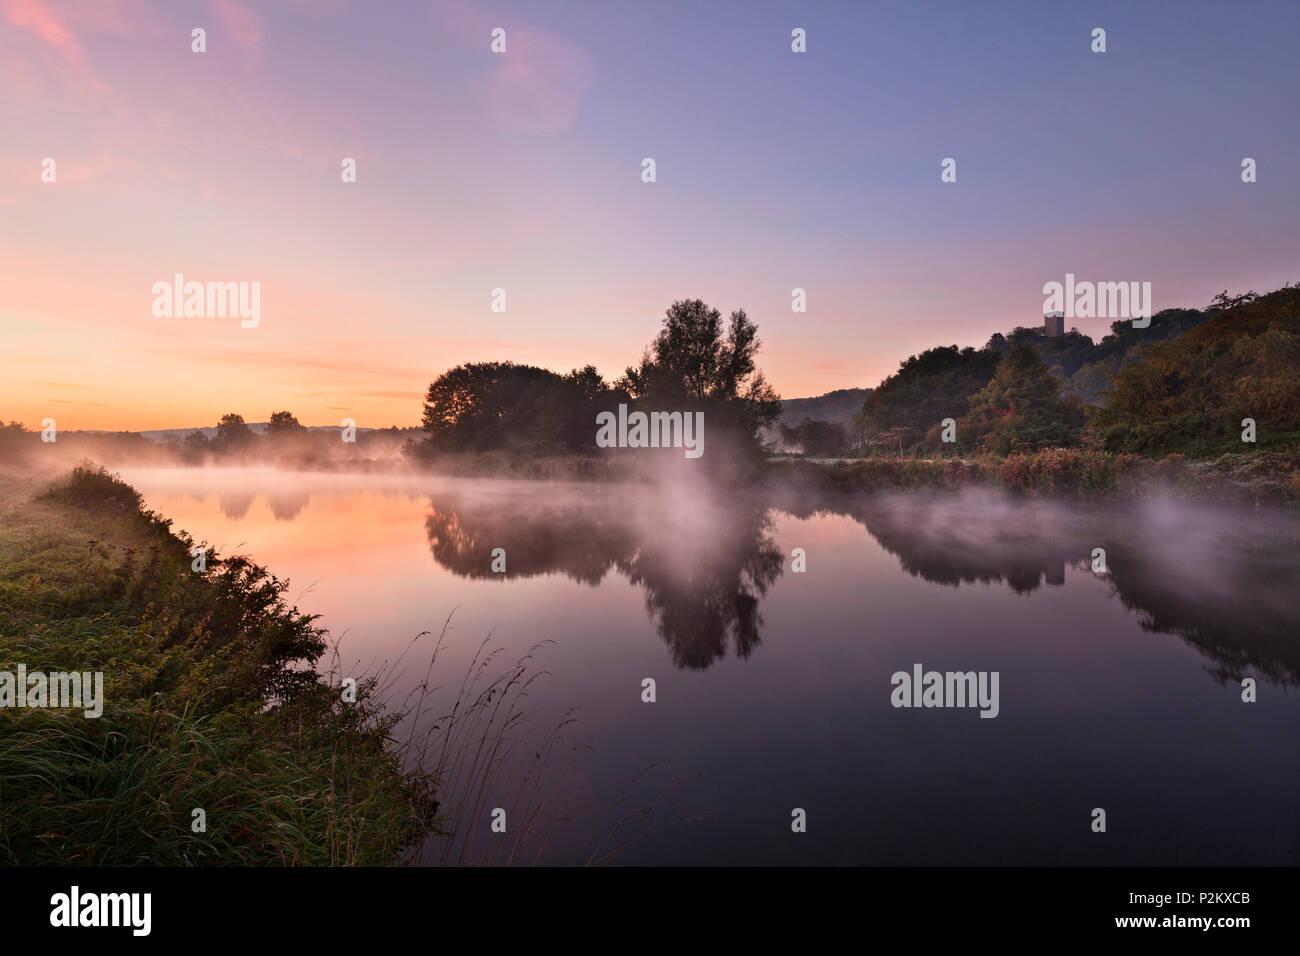 Morning mist, Ruhr river with Blankenstein castle, near Hattingen, Ruhr area, North-Rhine Westphalia, Germany - Stock Image